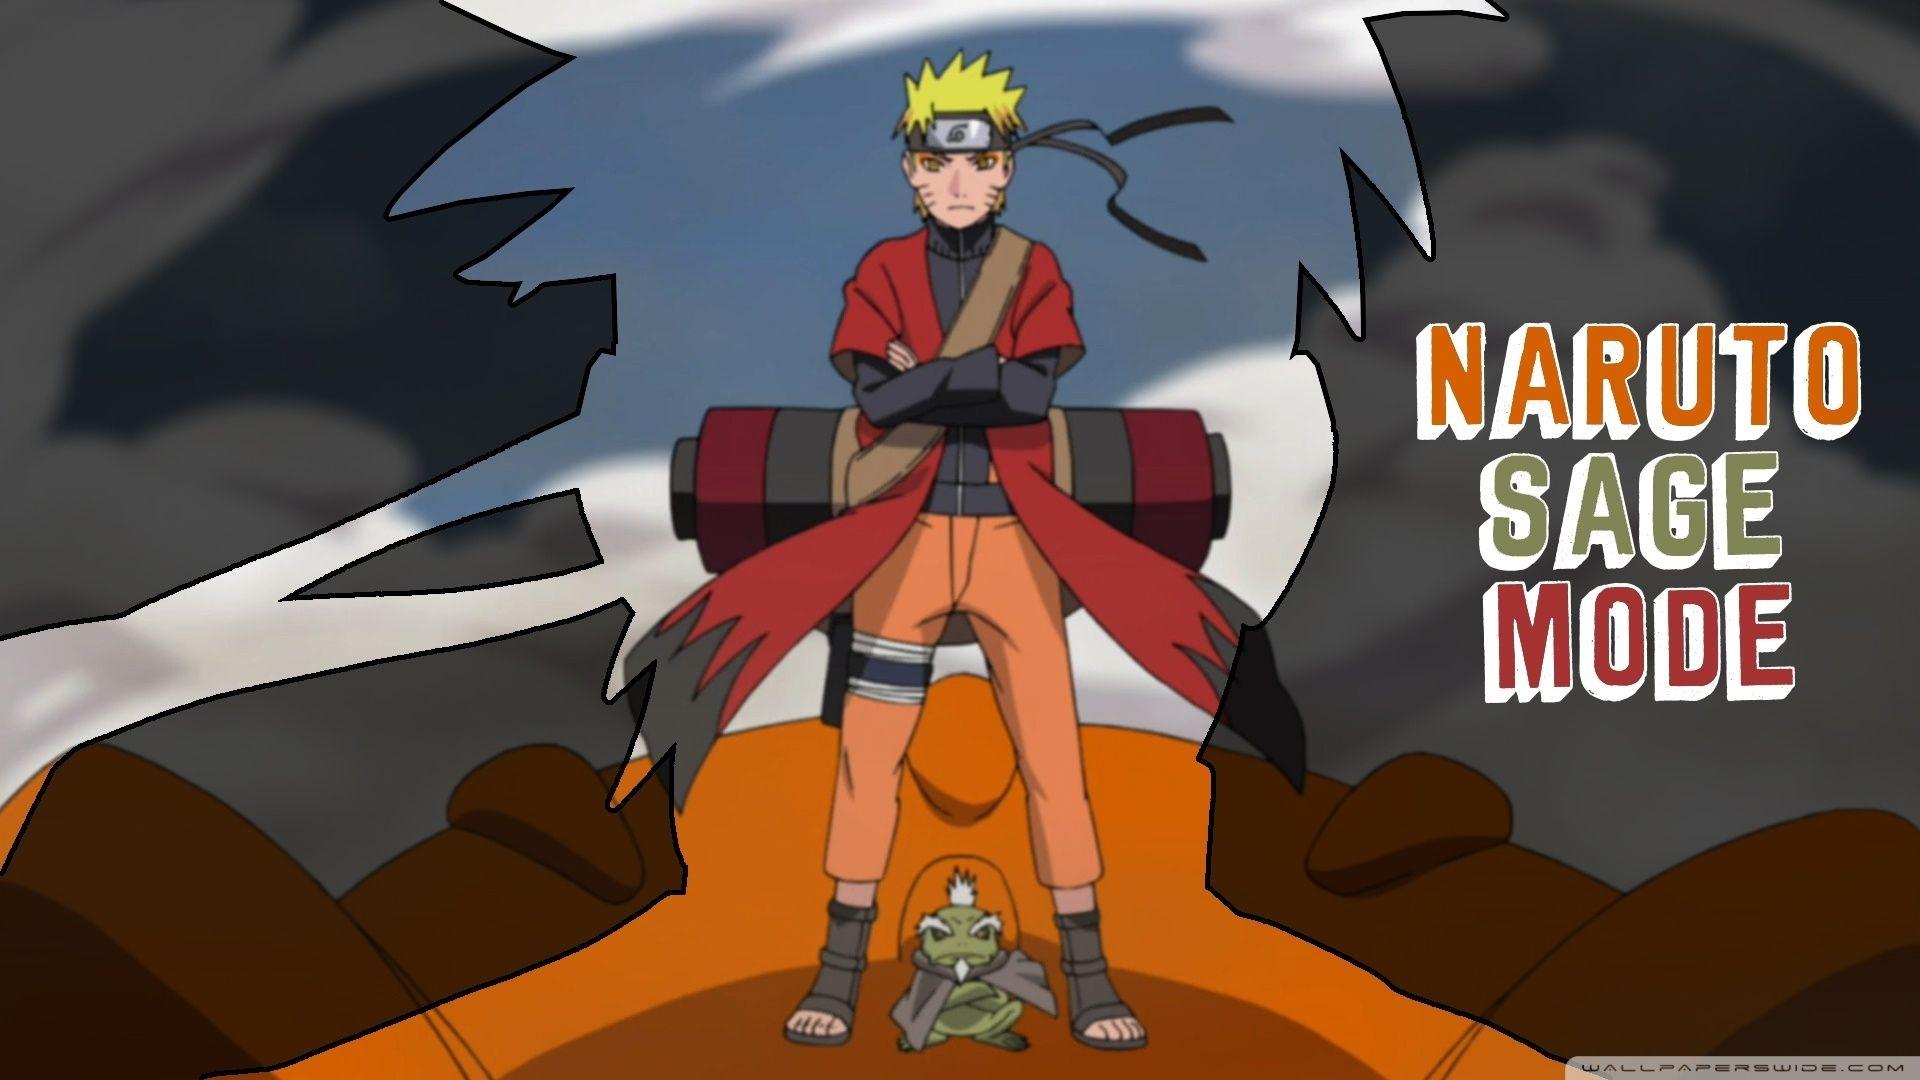 Naruto Uzumaki 4k Wallpaper With Images Naruto Sage